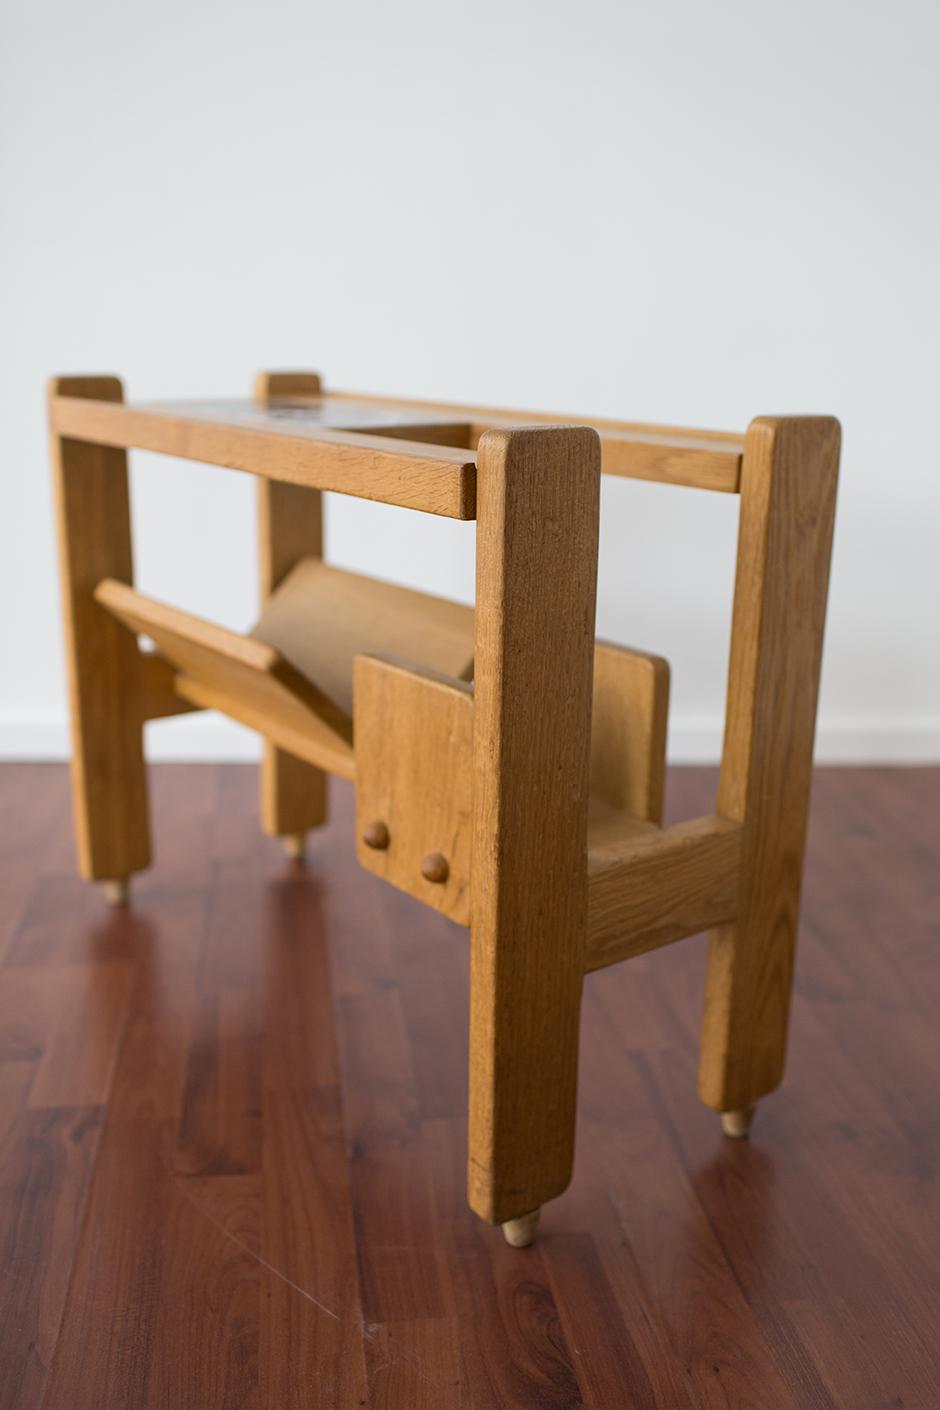 robert guillerme et jacques chambron mg galerie. Black Bedroom Furniture Sets. Home Design Ideas